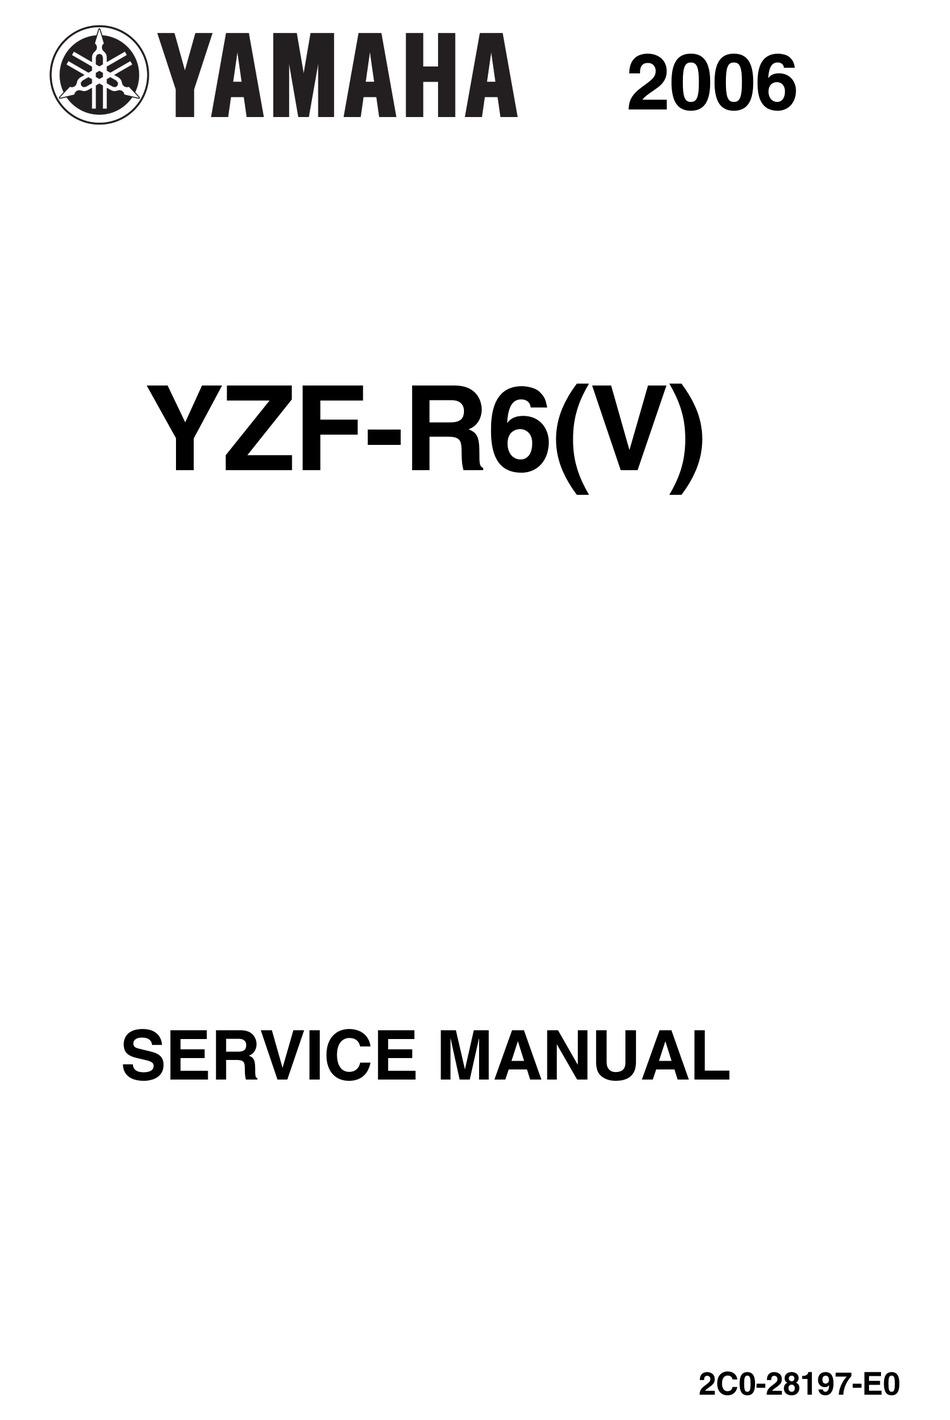 YAMAHA YZF R40V 20040 SERVICE MANUAL Pdf Download   ManualsLib